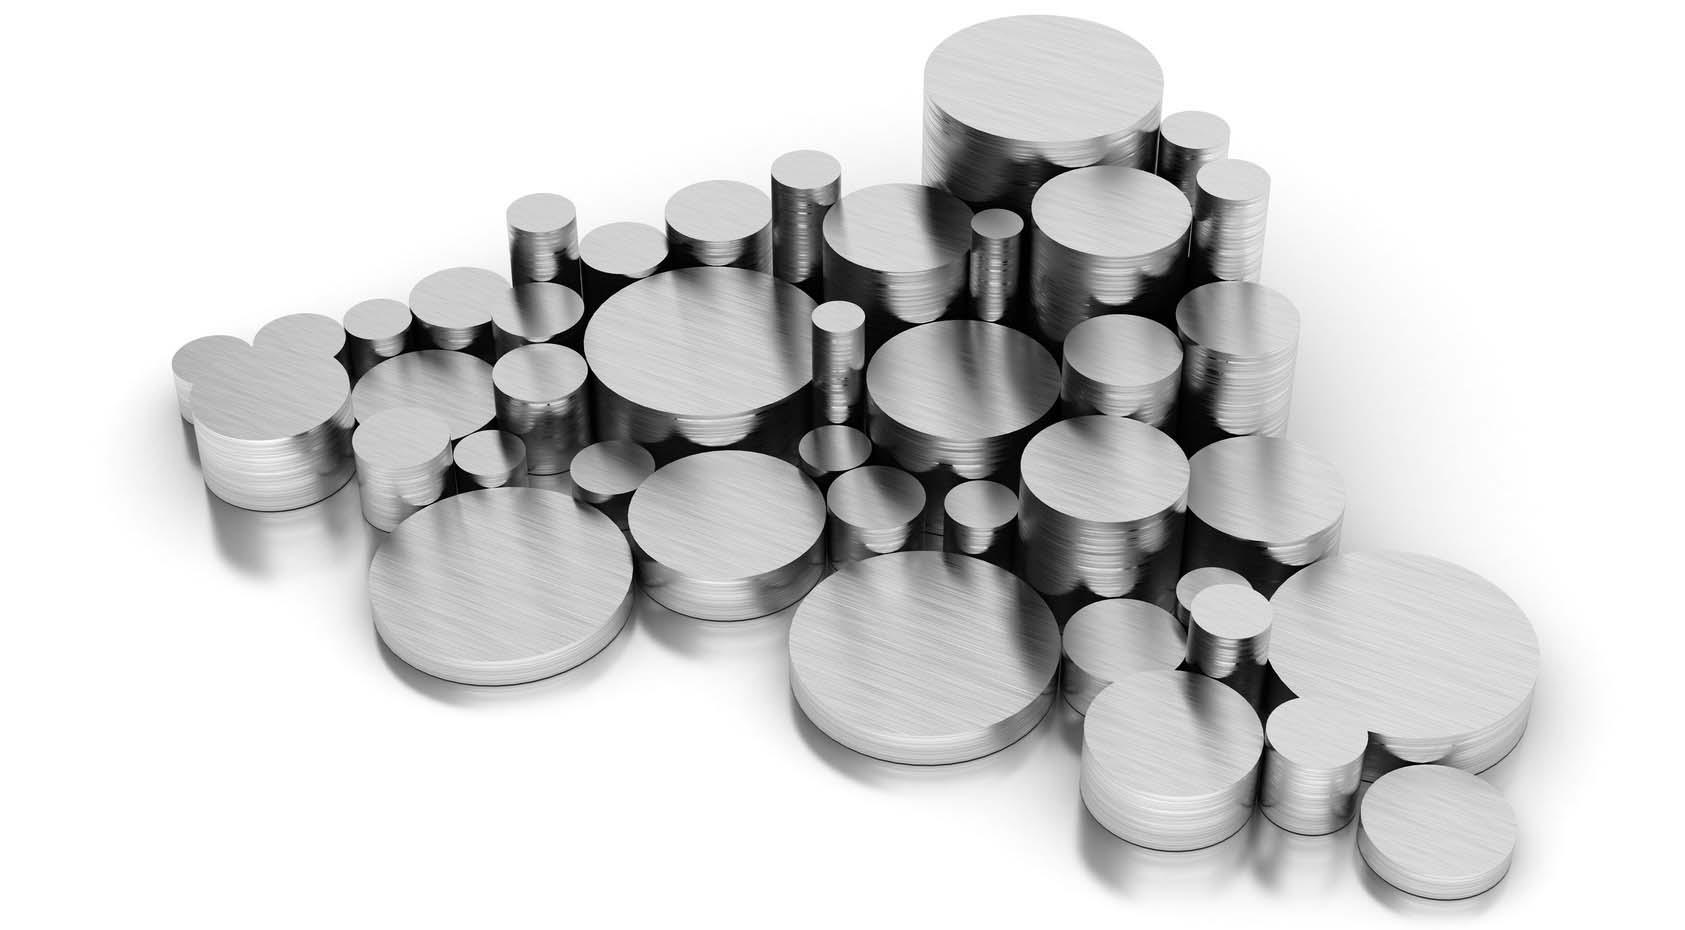 vendita-barre-tubolari-inox